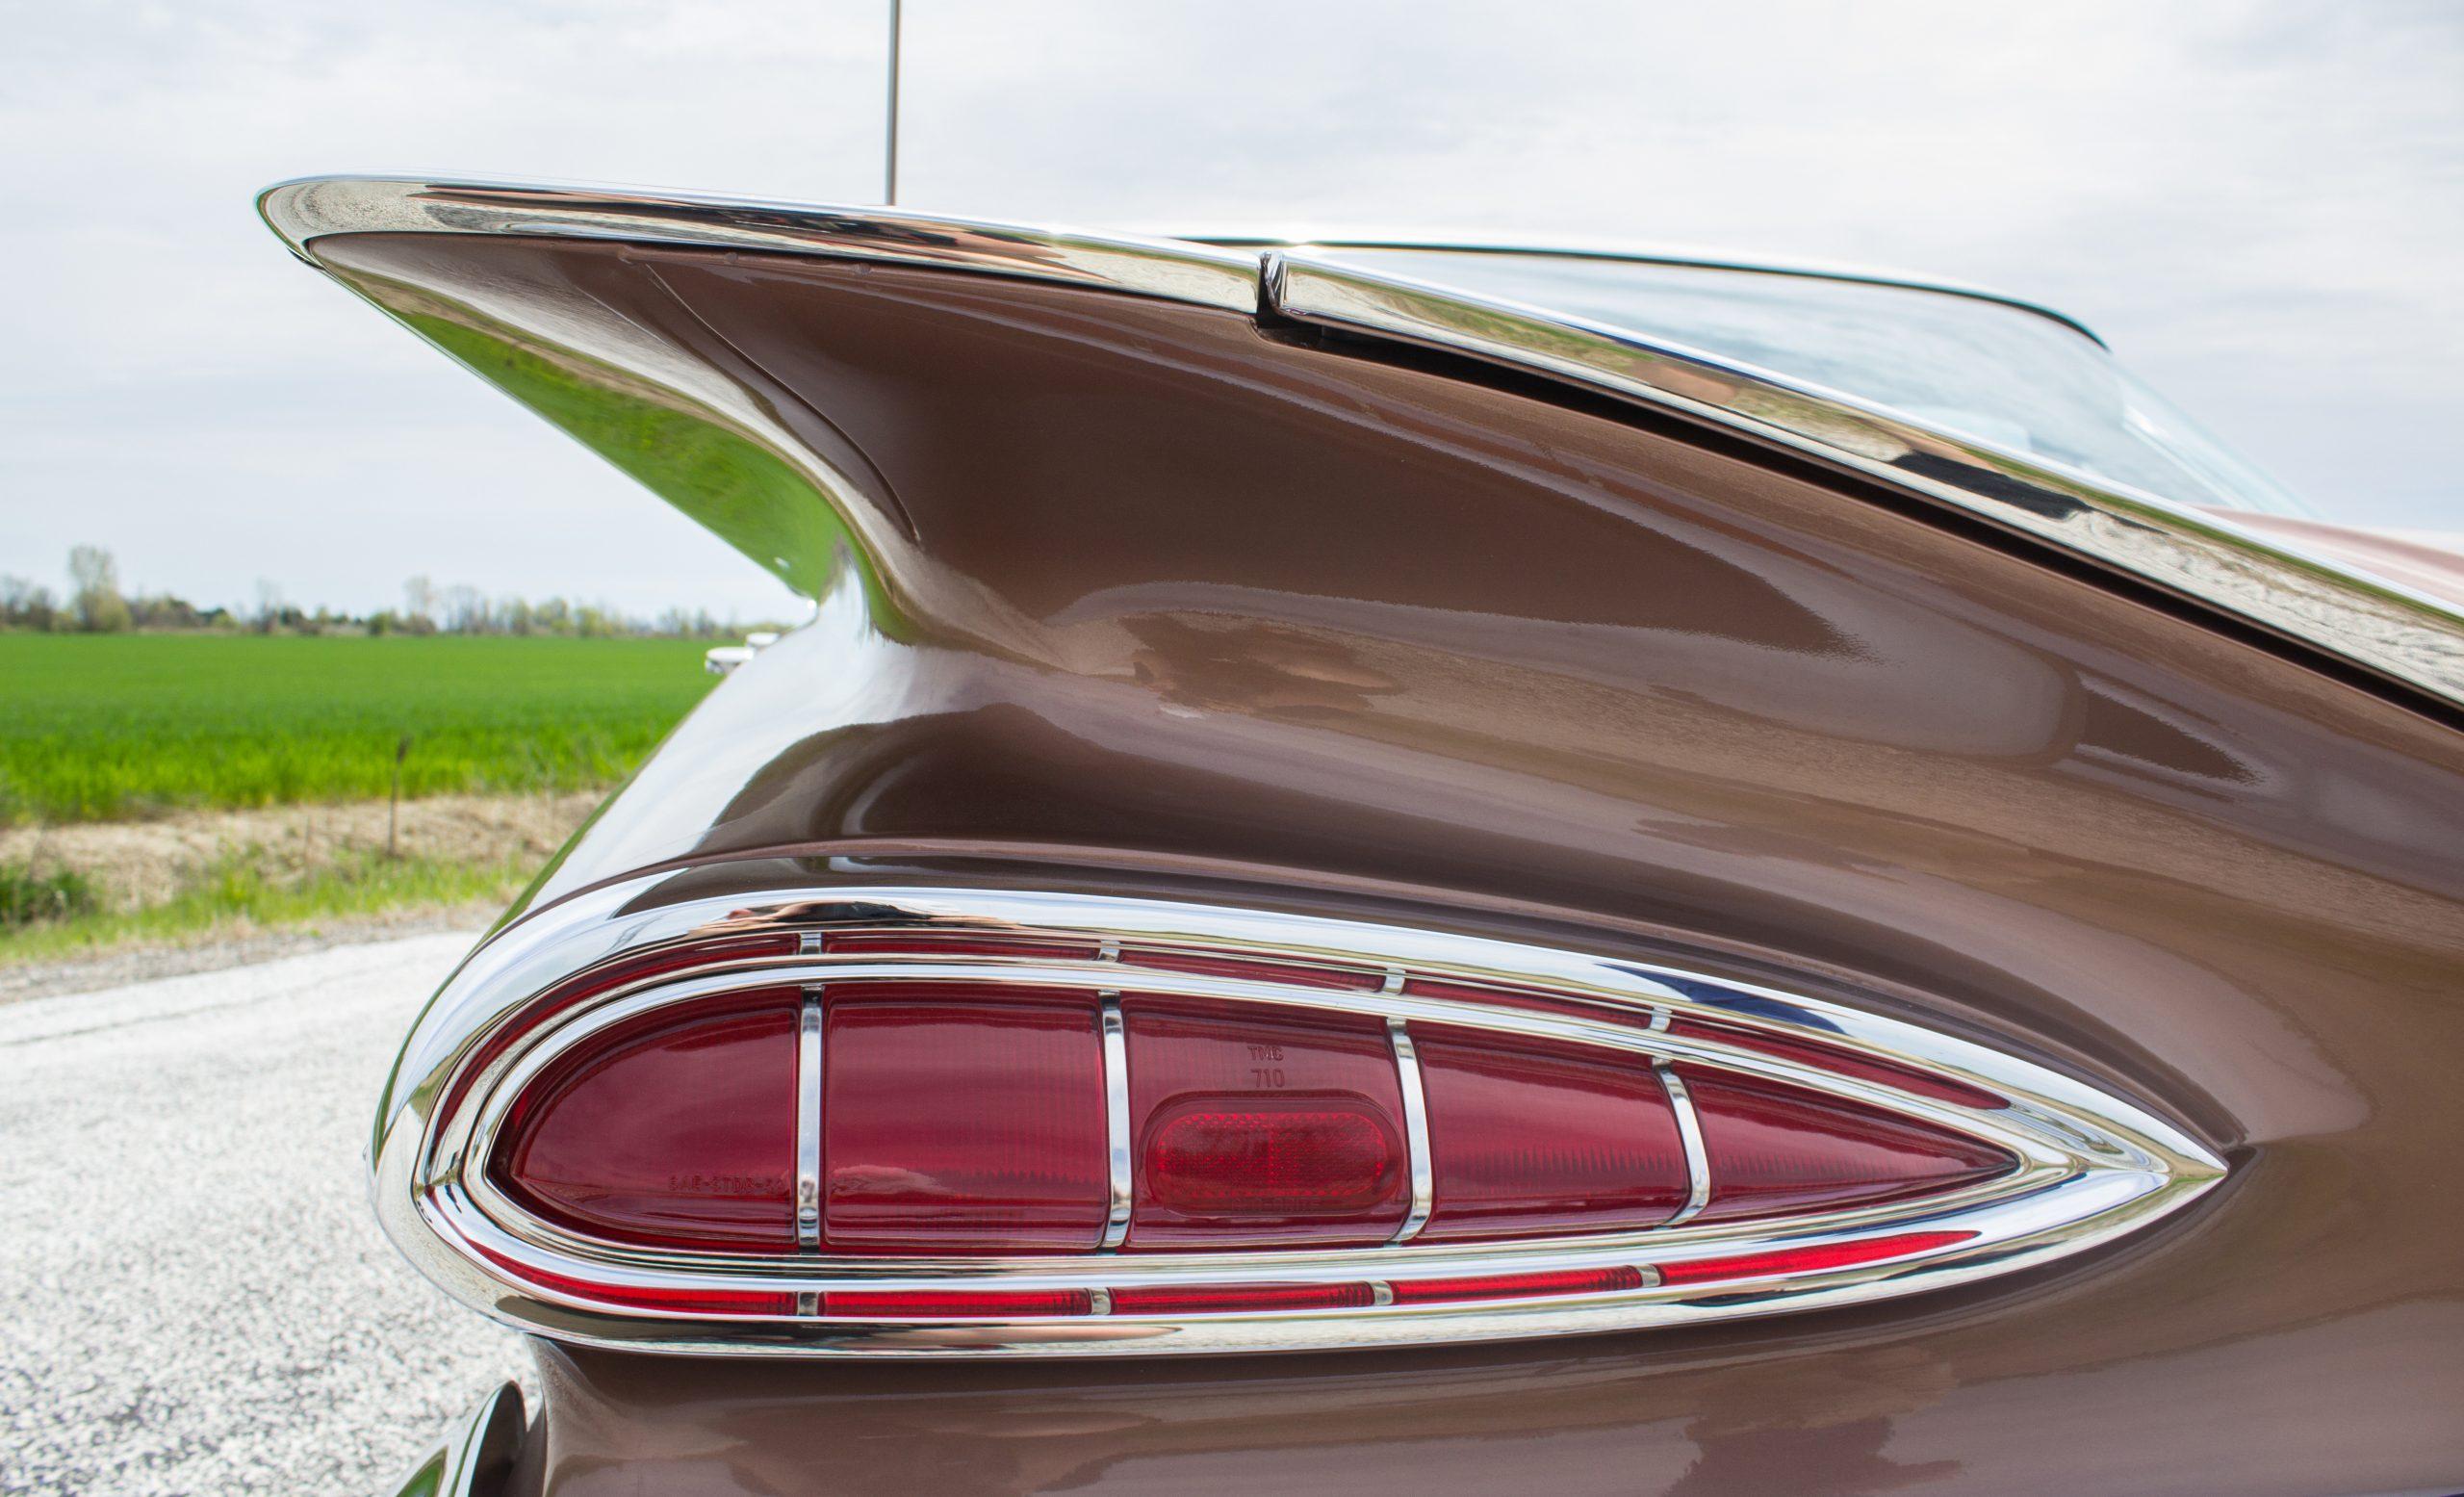 1959 Chevrolet Bel Air tail fin